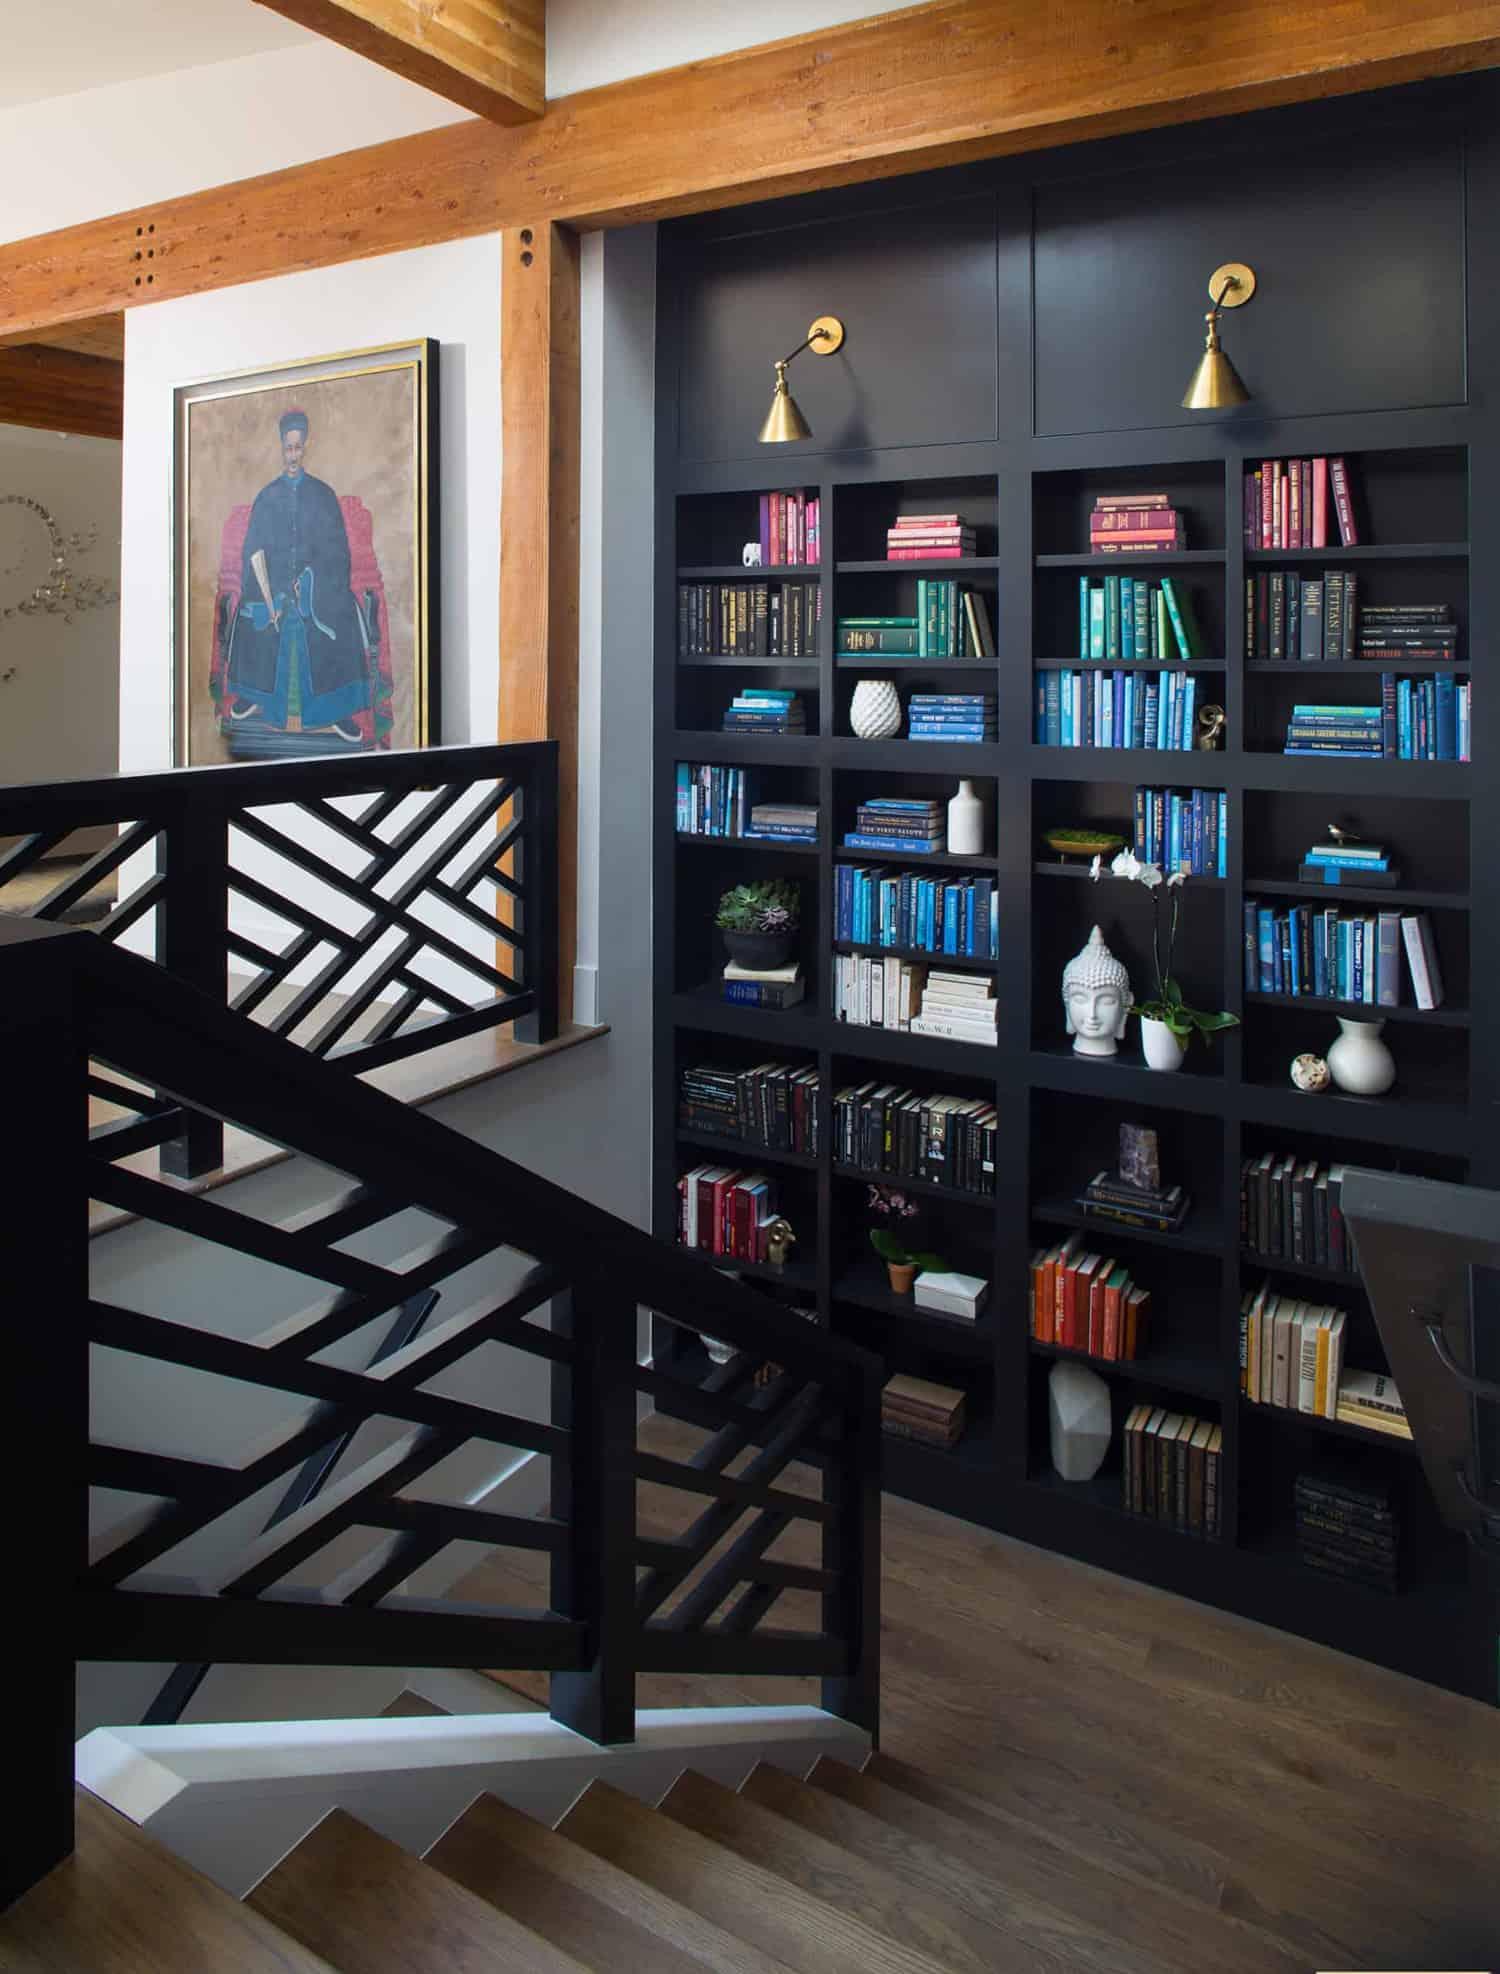 contemporary-staircase-bookshelf